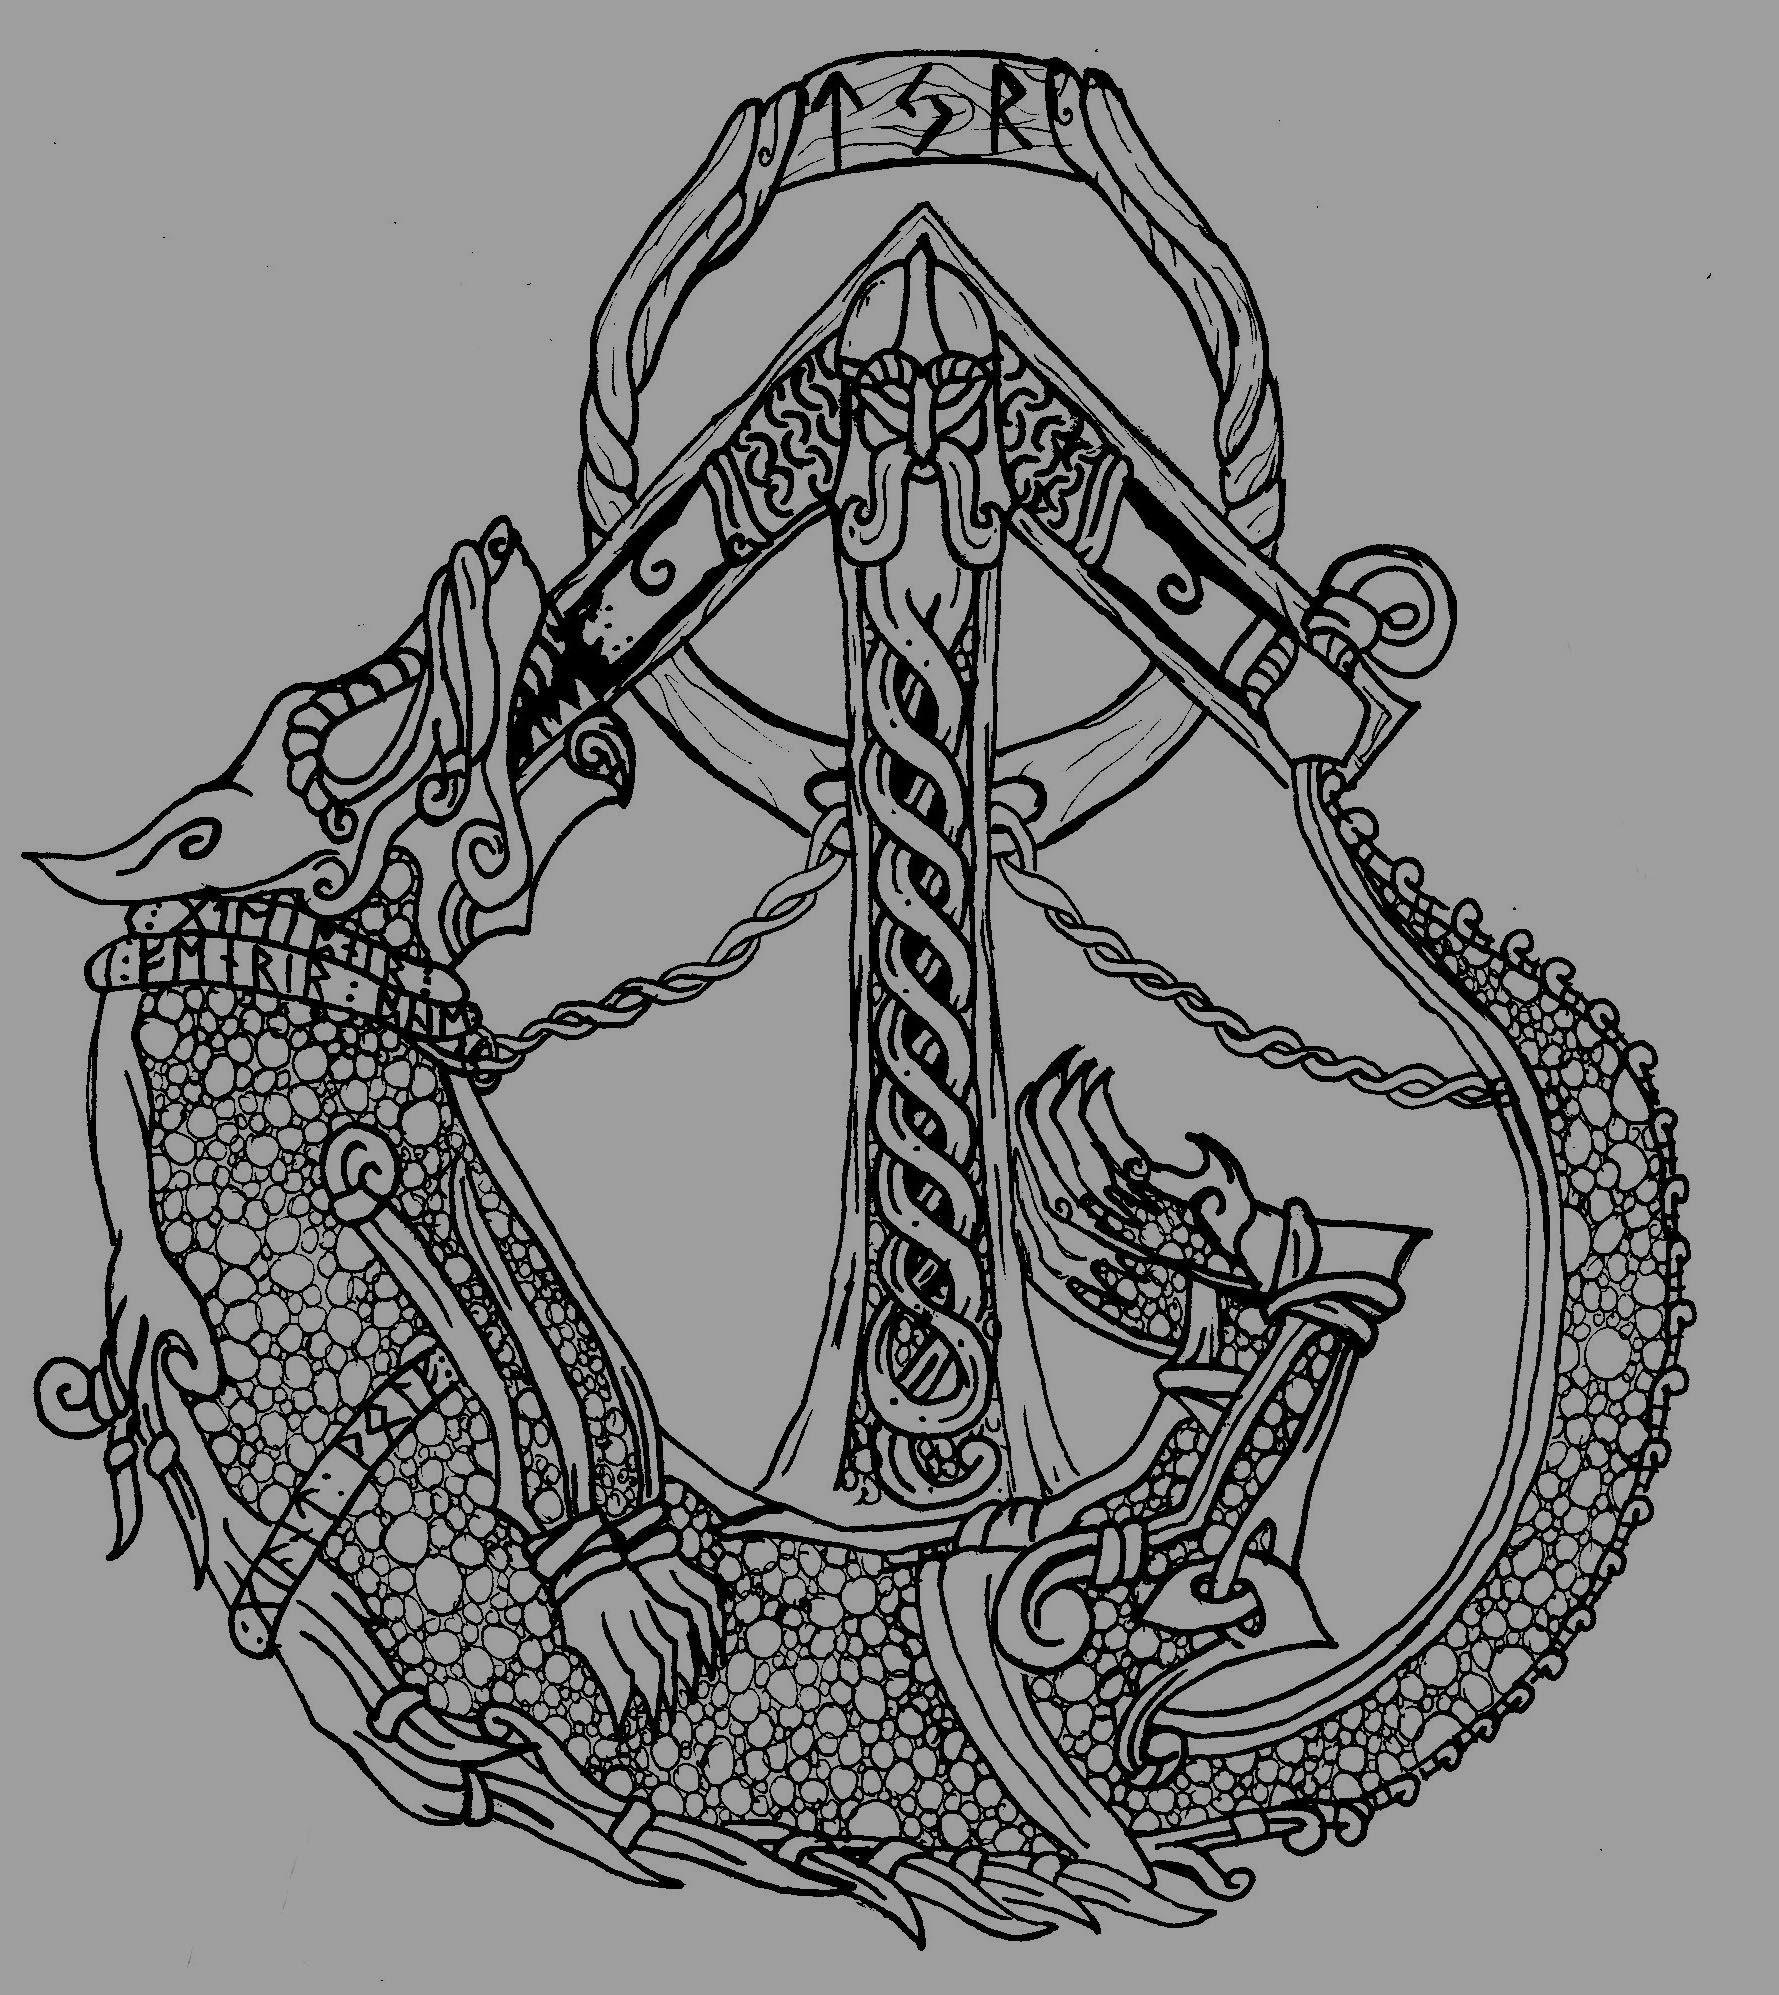 Tyr and Fenrir Norse tattoo, Viking tattoos, Nordic tattoo